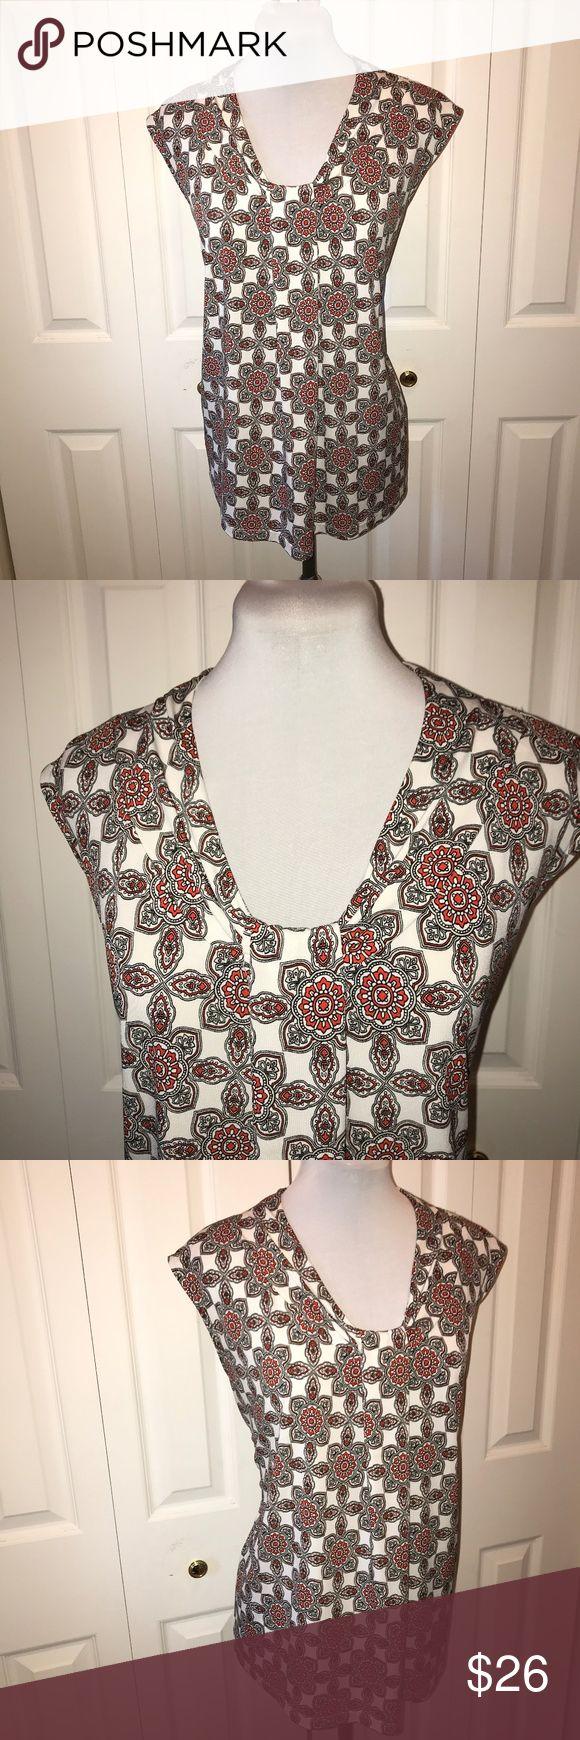 "Dana Buchman Sleeveless Tunic Top Mandala Print XL Dana Buchman Sleeveless Tunic Top Mandala Print XL Measurements taken Unstretched Bust: 46"" Waist: 45"" Hip: 48"" Length: 25"" Dana Buchman Tops Tunics"